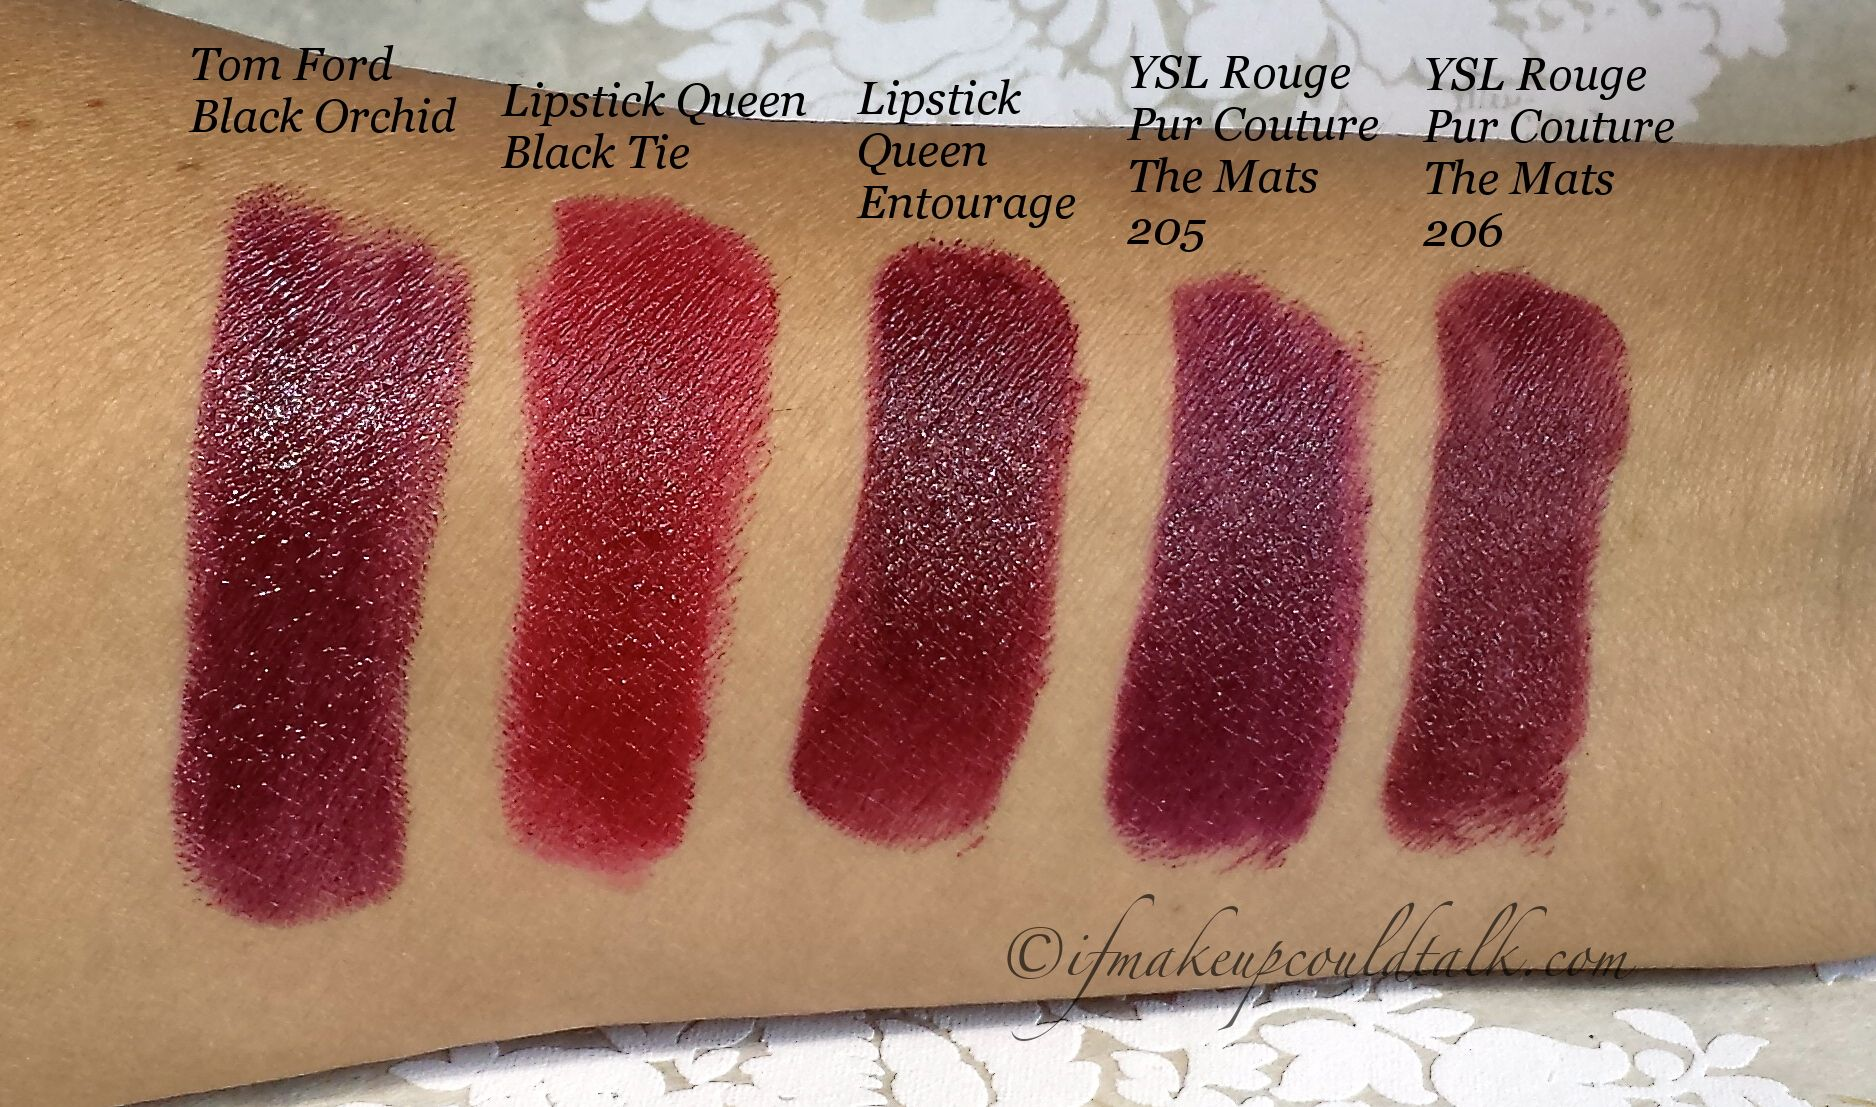 Dark Red Lipstick Comparisons Tom Ford Black Orchid